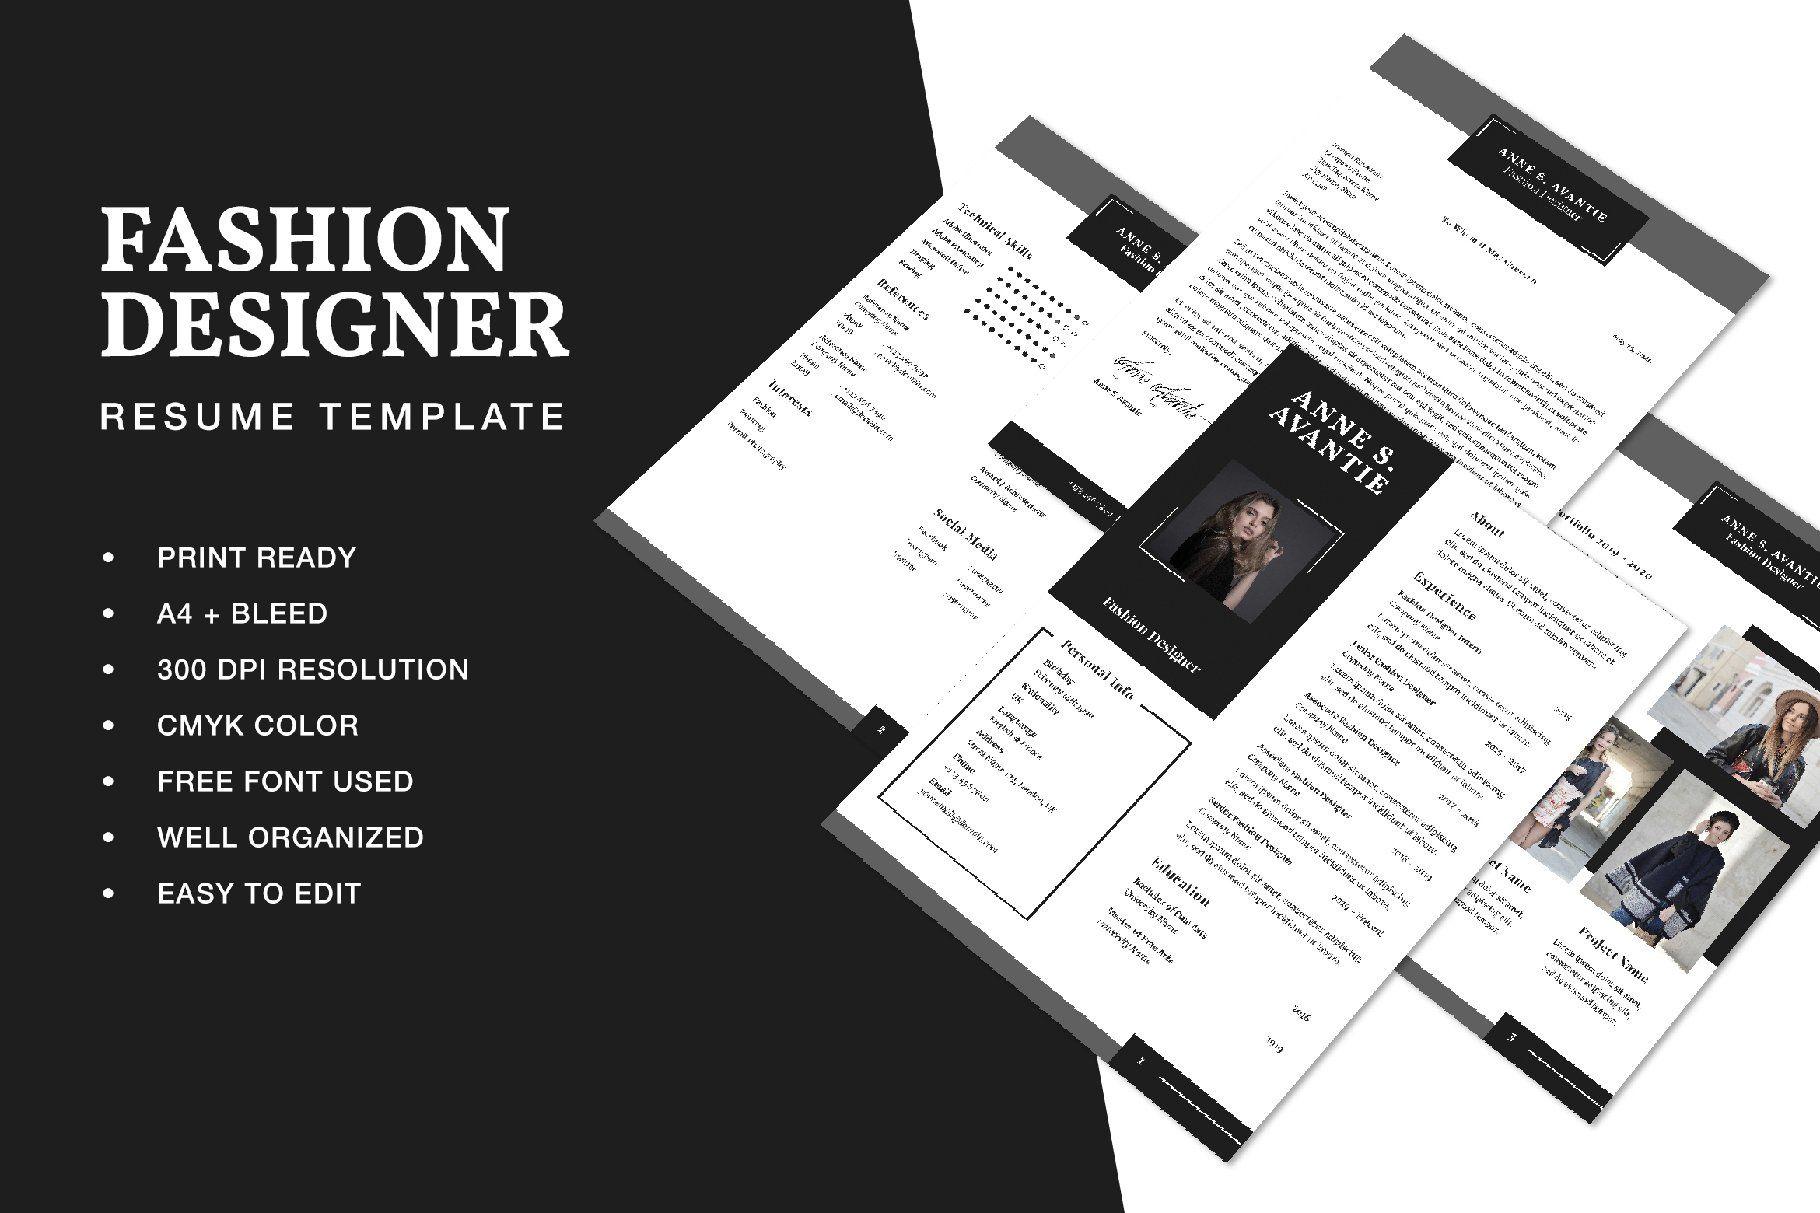 Fashion designer resume cv template by formatika studio on